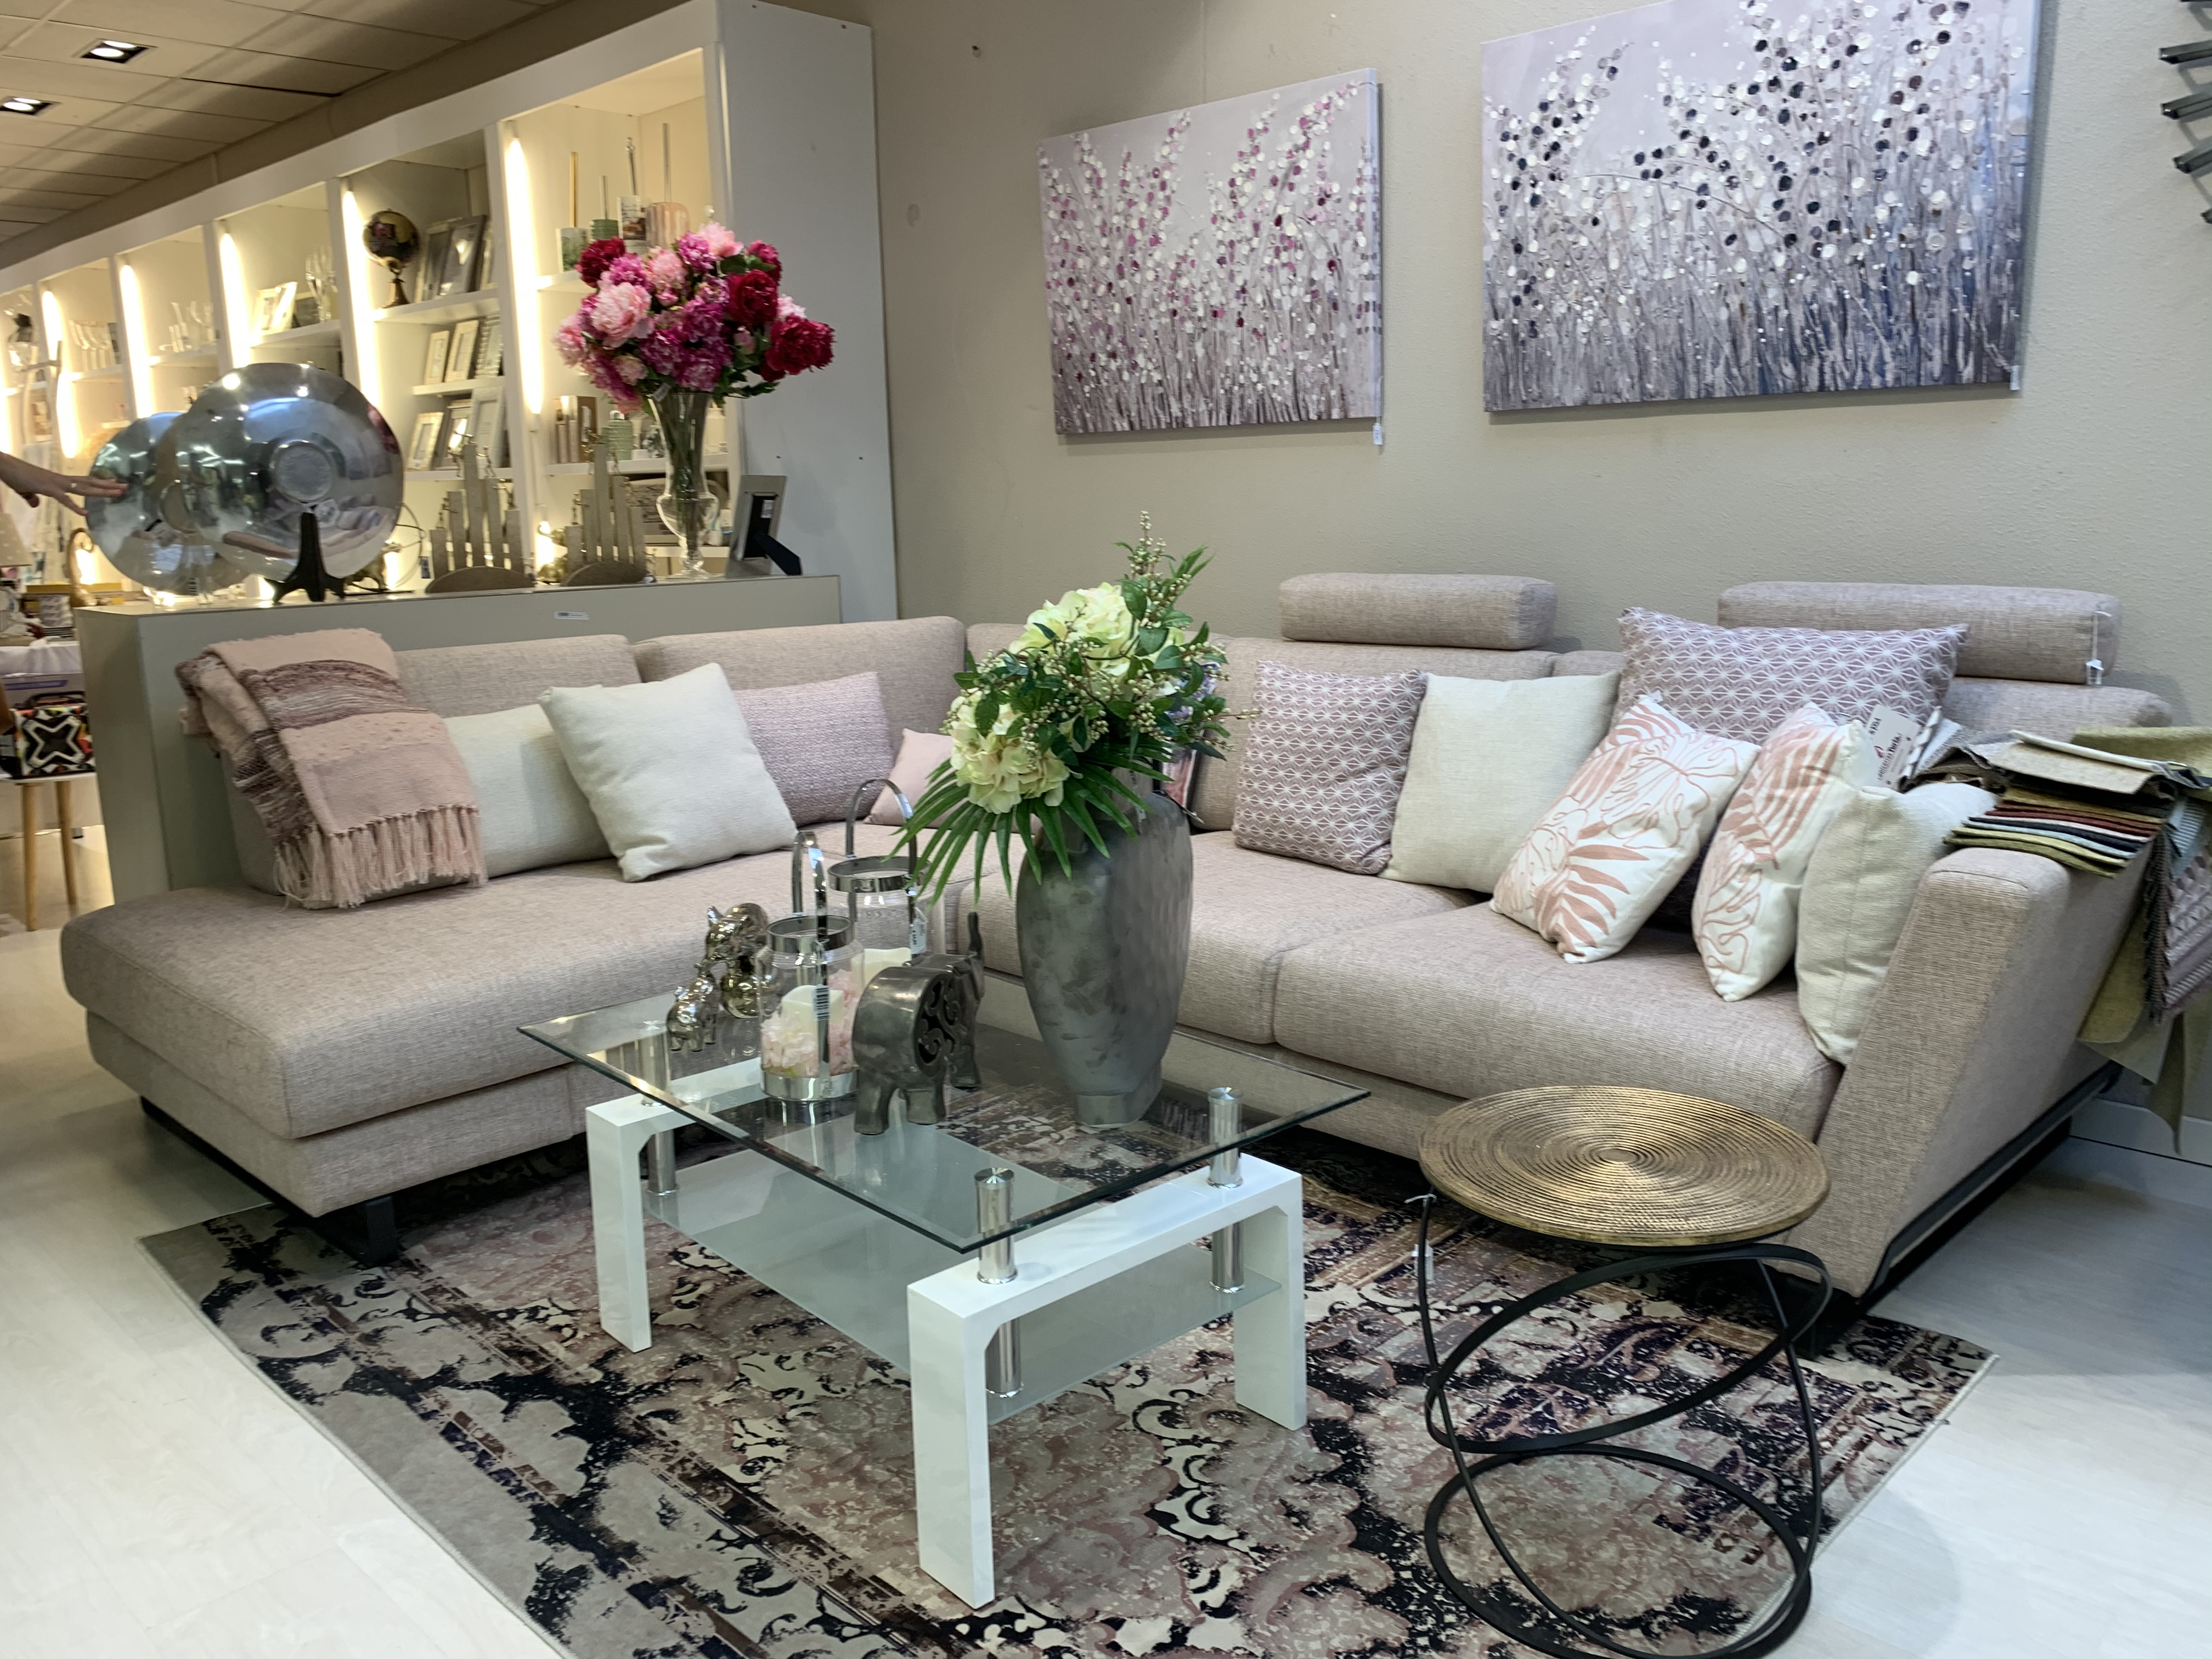 artica tiendas sofa Erika